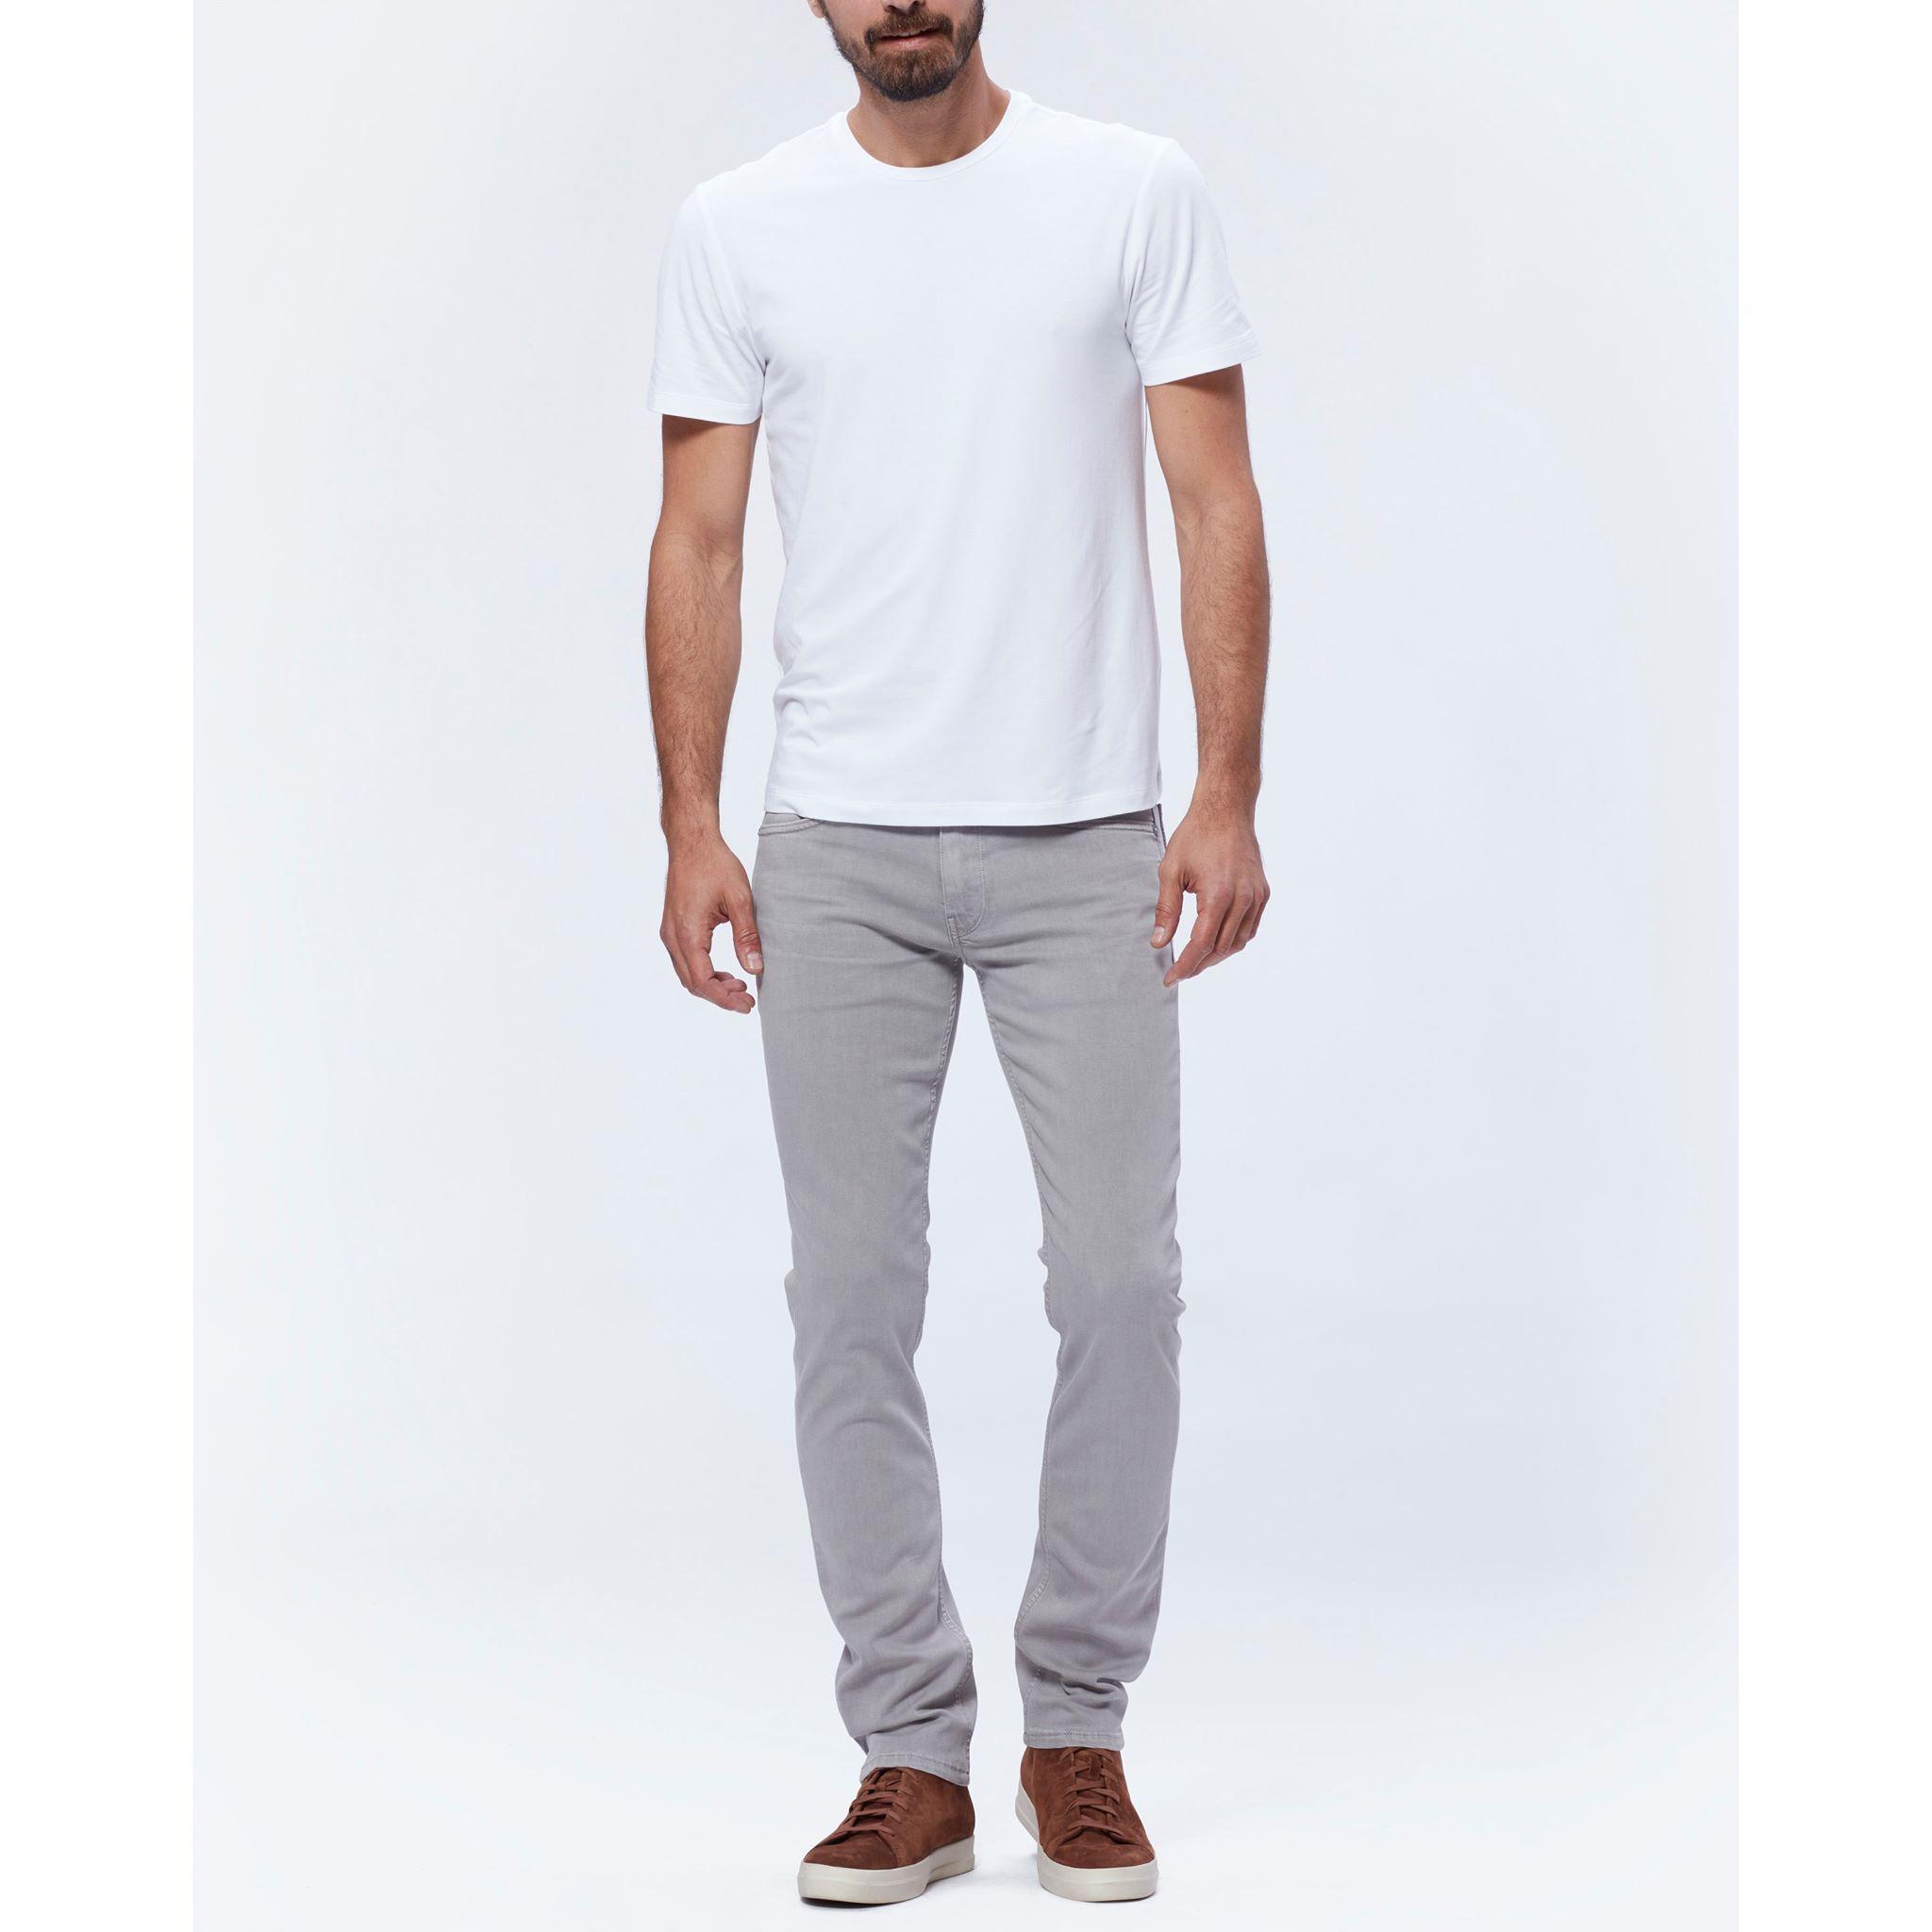 PAIGE Men's Cash Crew Neck Tee Shirt - Fresh White | Short